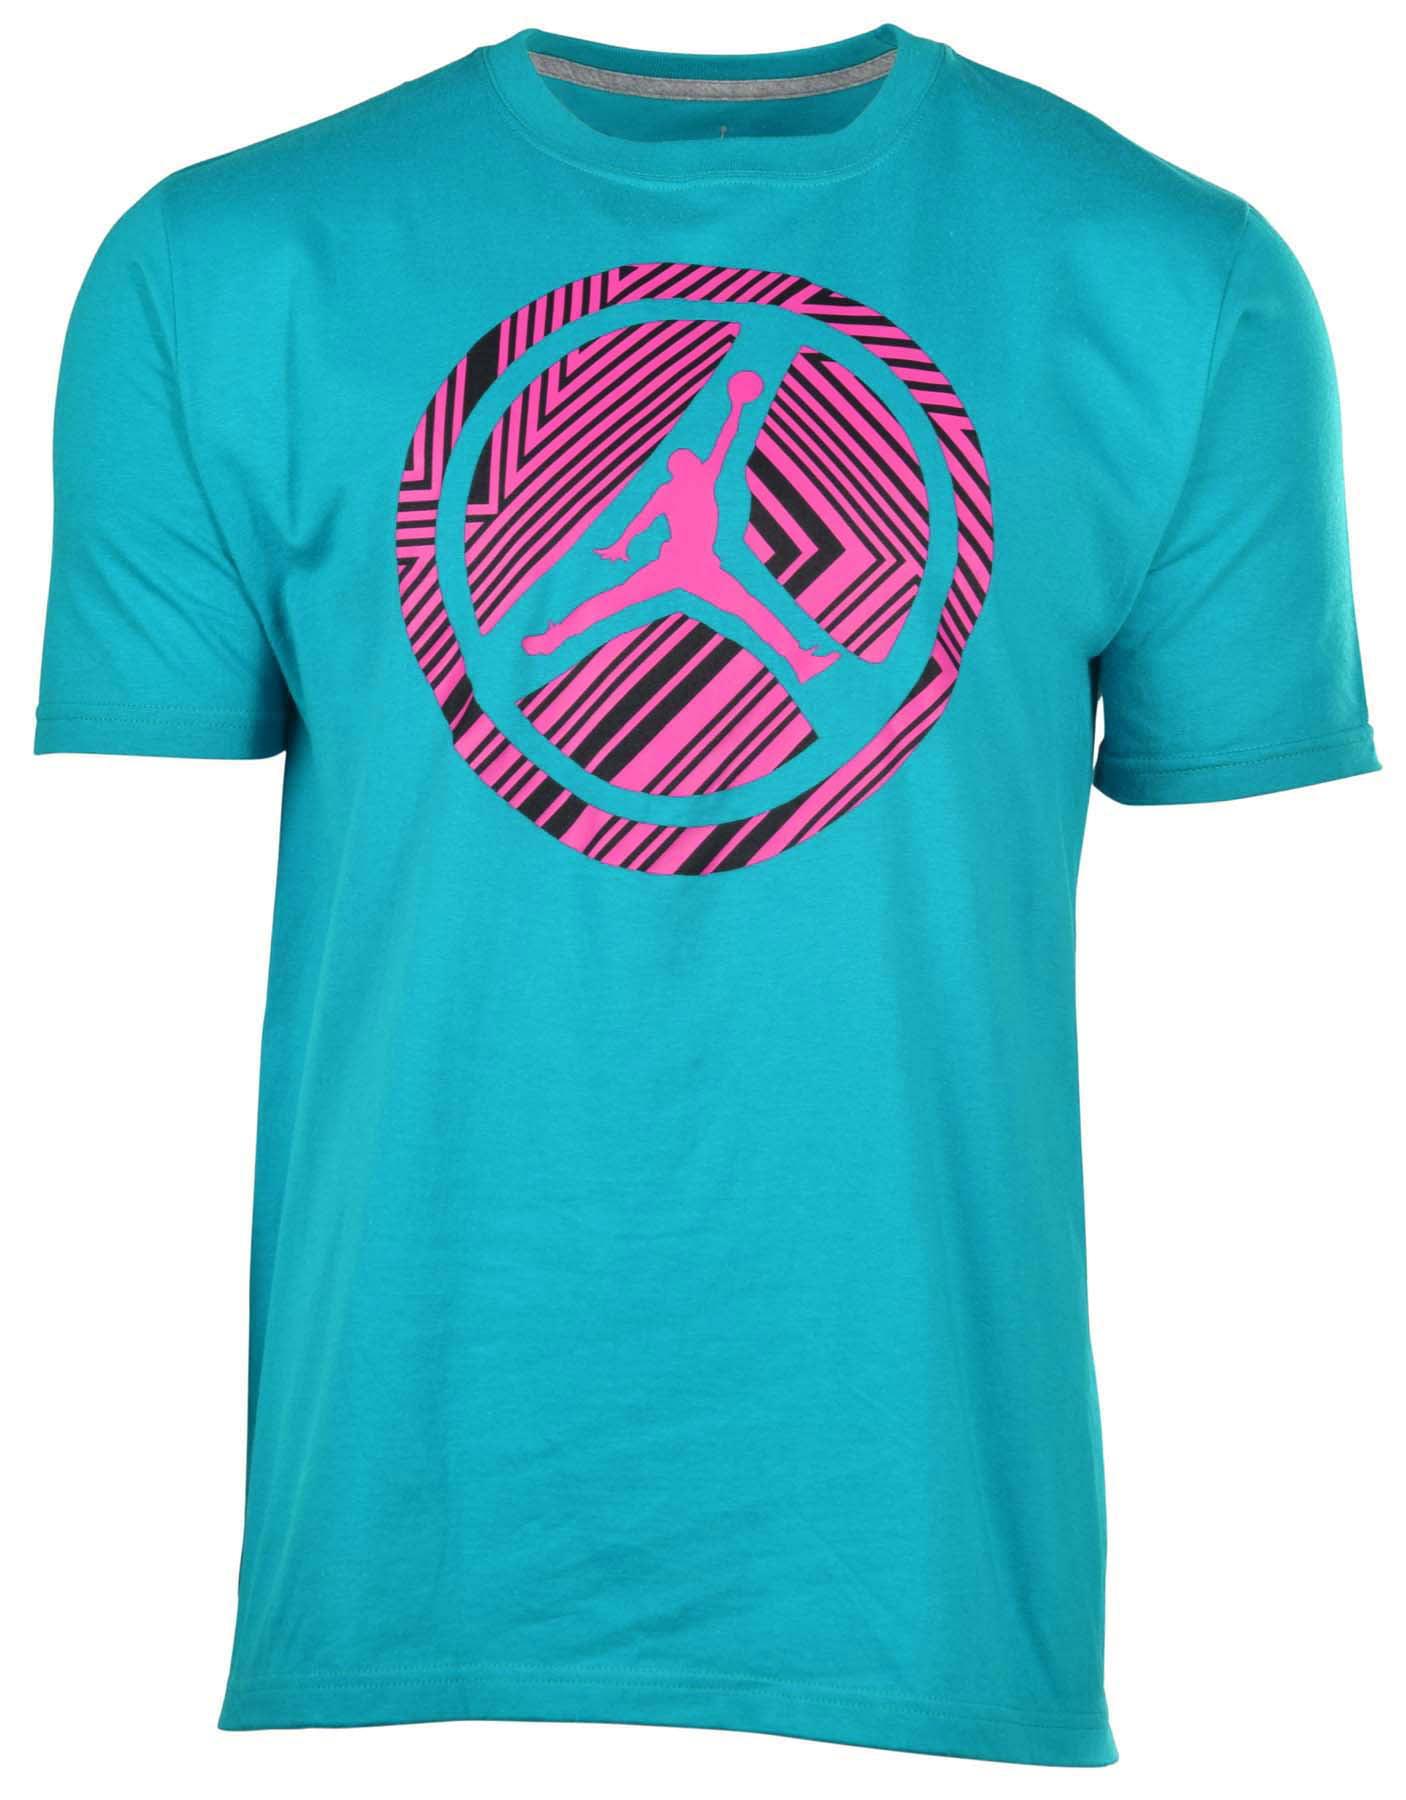 e49d553e84a4 Jordan - Jordan Men s Nike Lined Pinwheel Jumpman T-Shirt-Teal - Walmart.com